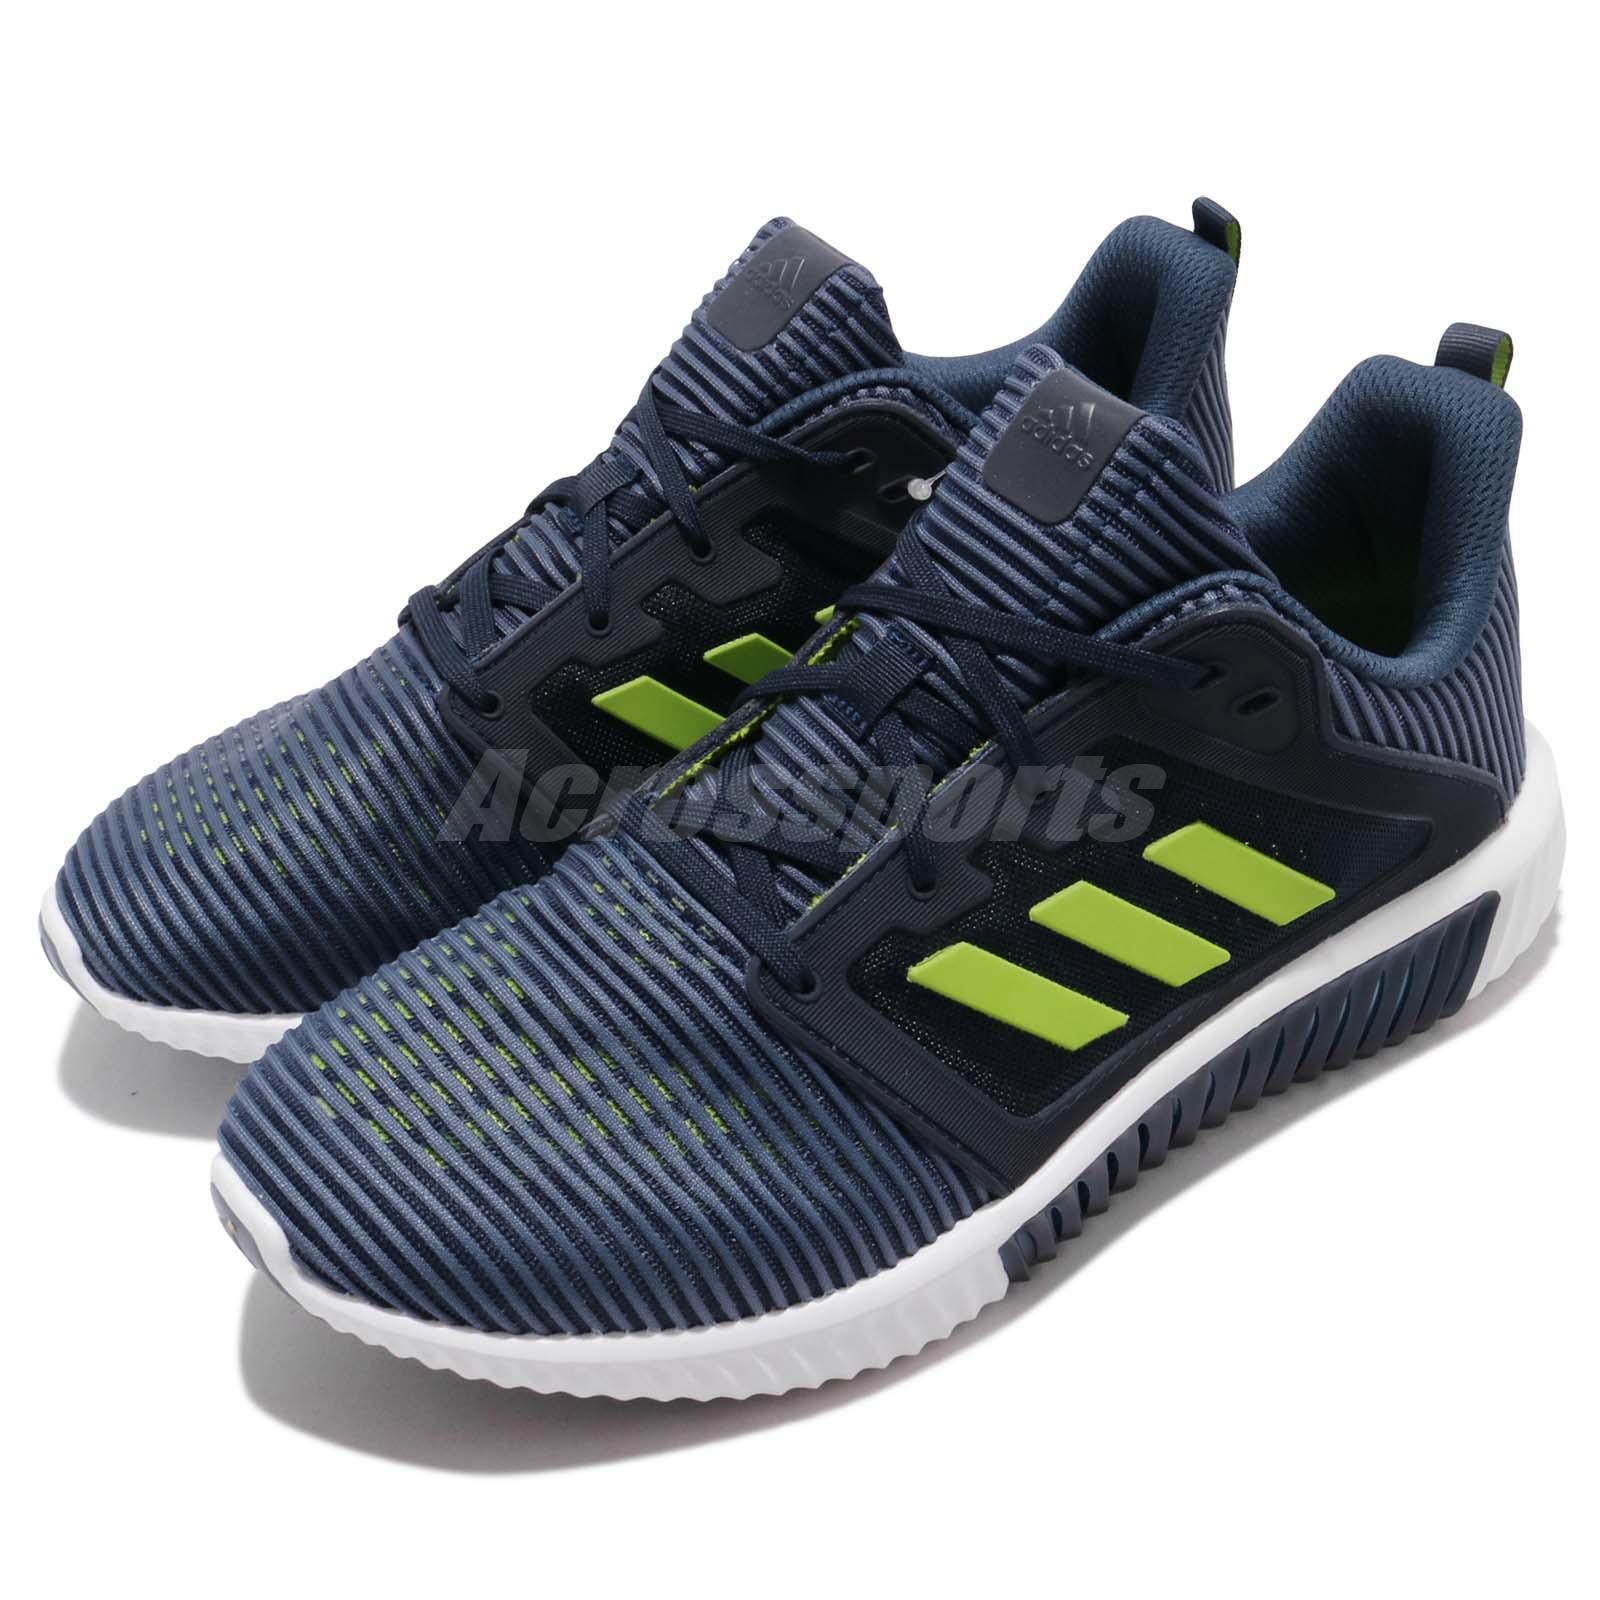 adidas Climacool Vent M ΞšΟΟ€Ξ΅Ξ»Ξ»ΞΏ Navy άνδρΡς άνδρΡς άνδρΡς άνδρΡς τρέχοντας παπούτσια CM7397